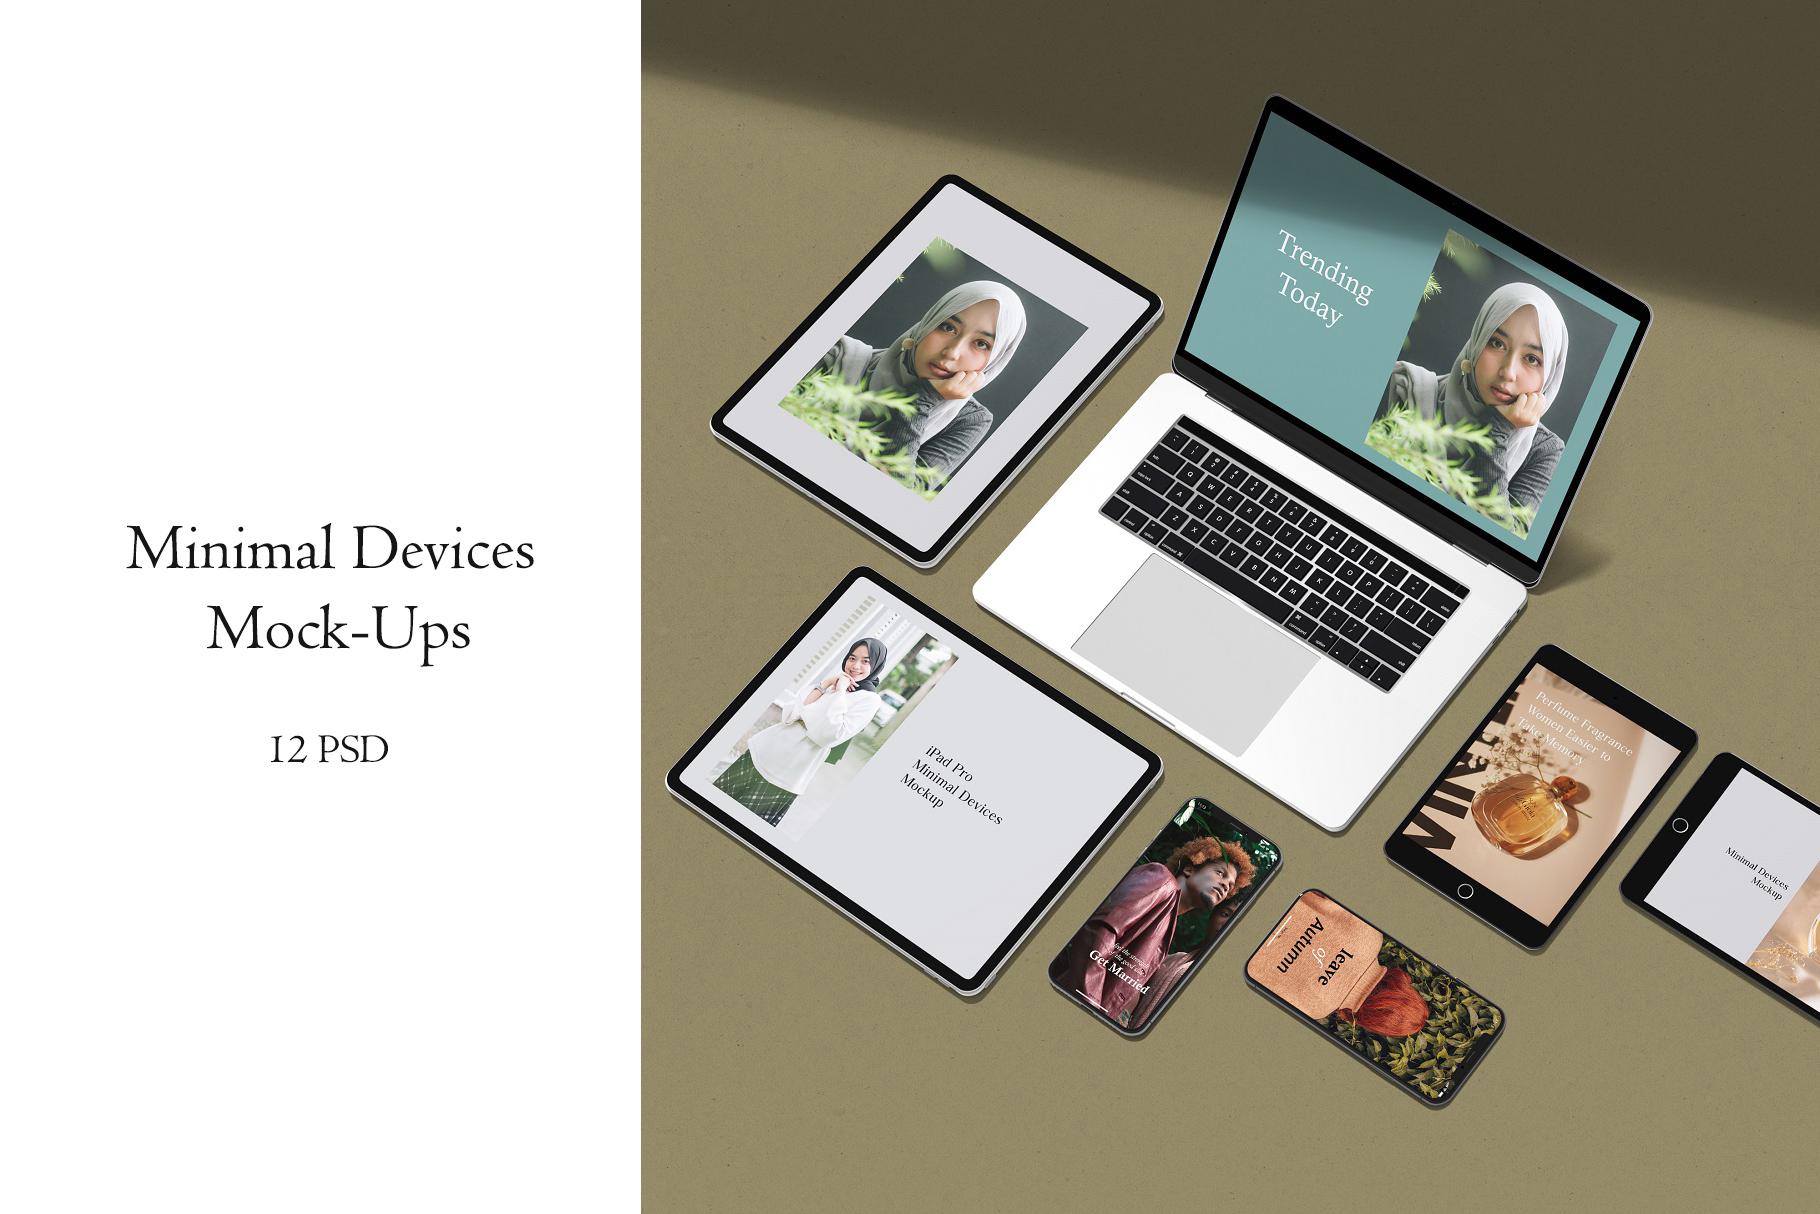 Minimal Devices Mock-Ups example image 1